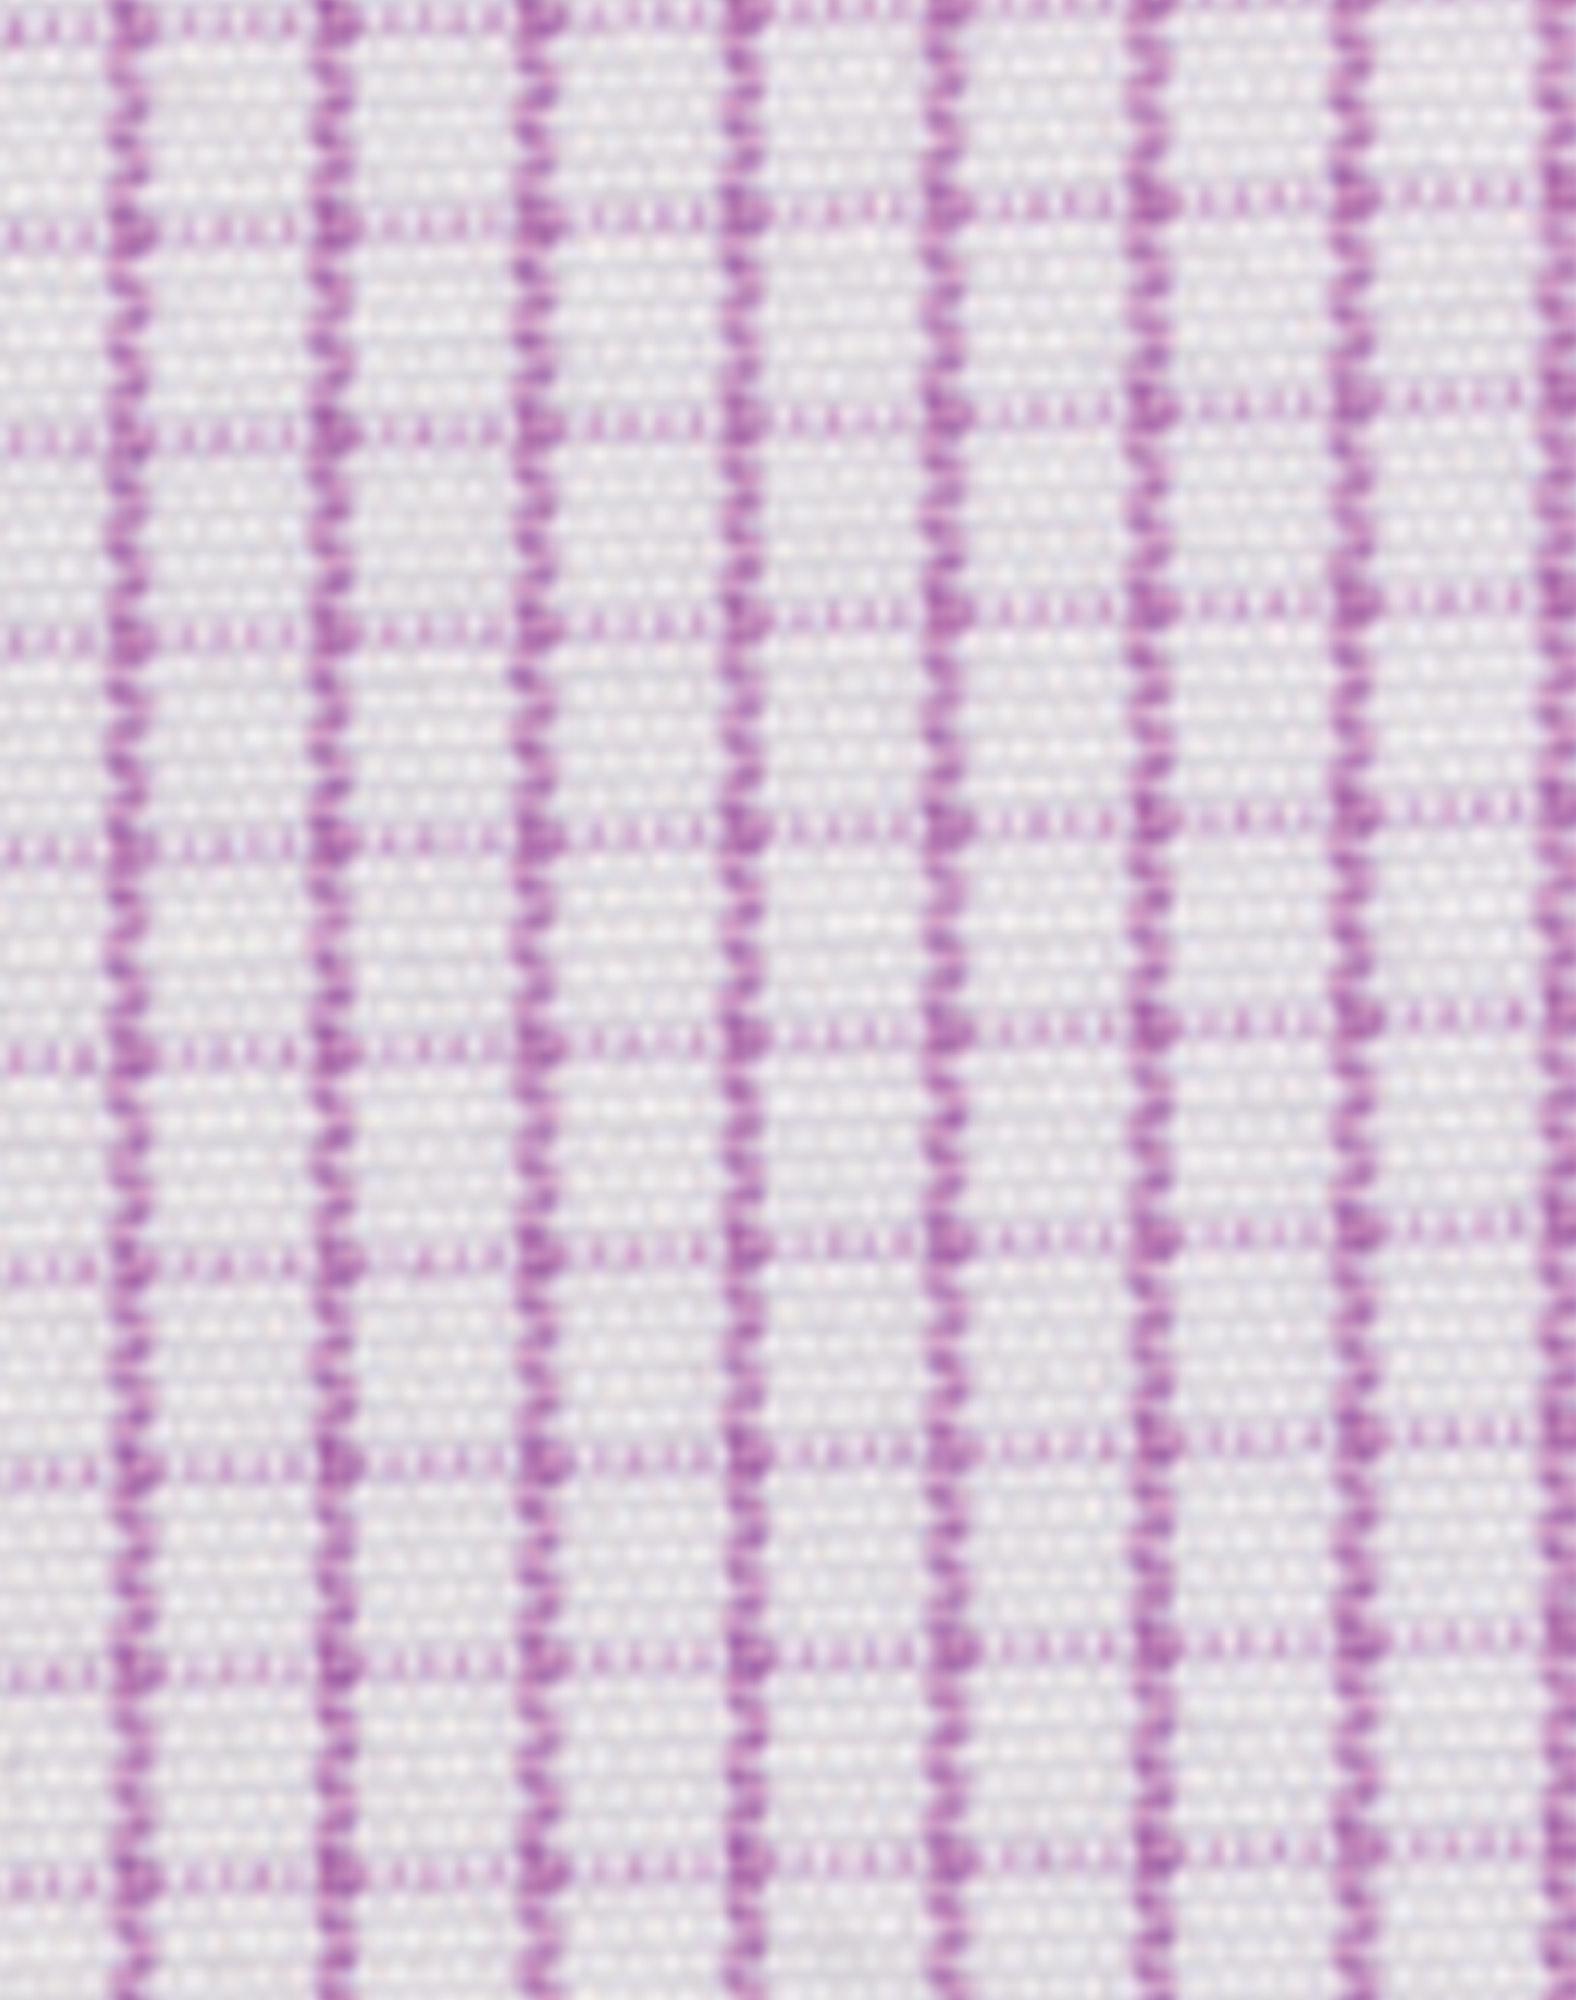 https://s3-ap-southeast-1.amazonaws.com/ws-imgs/BENCHMARK/M8360Q_Lilac_fabric.jpg